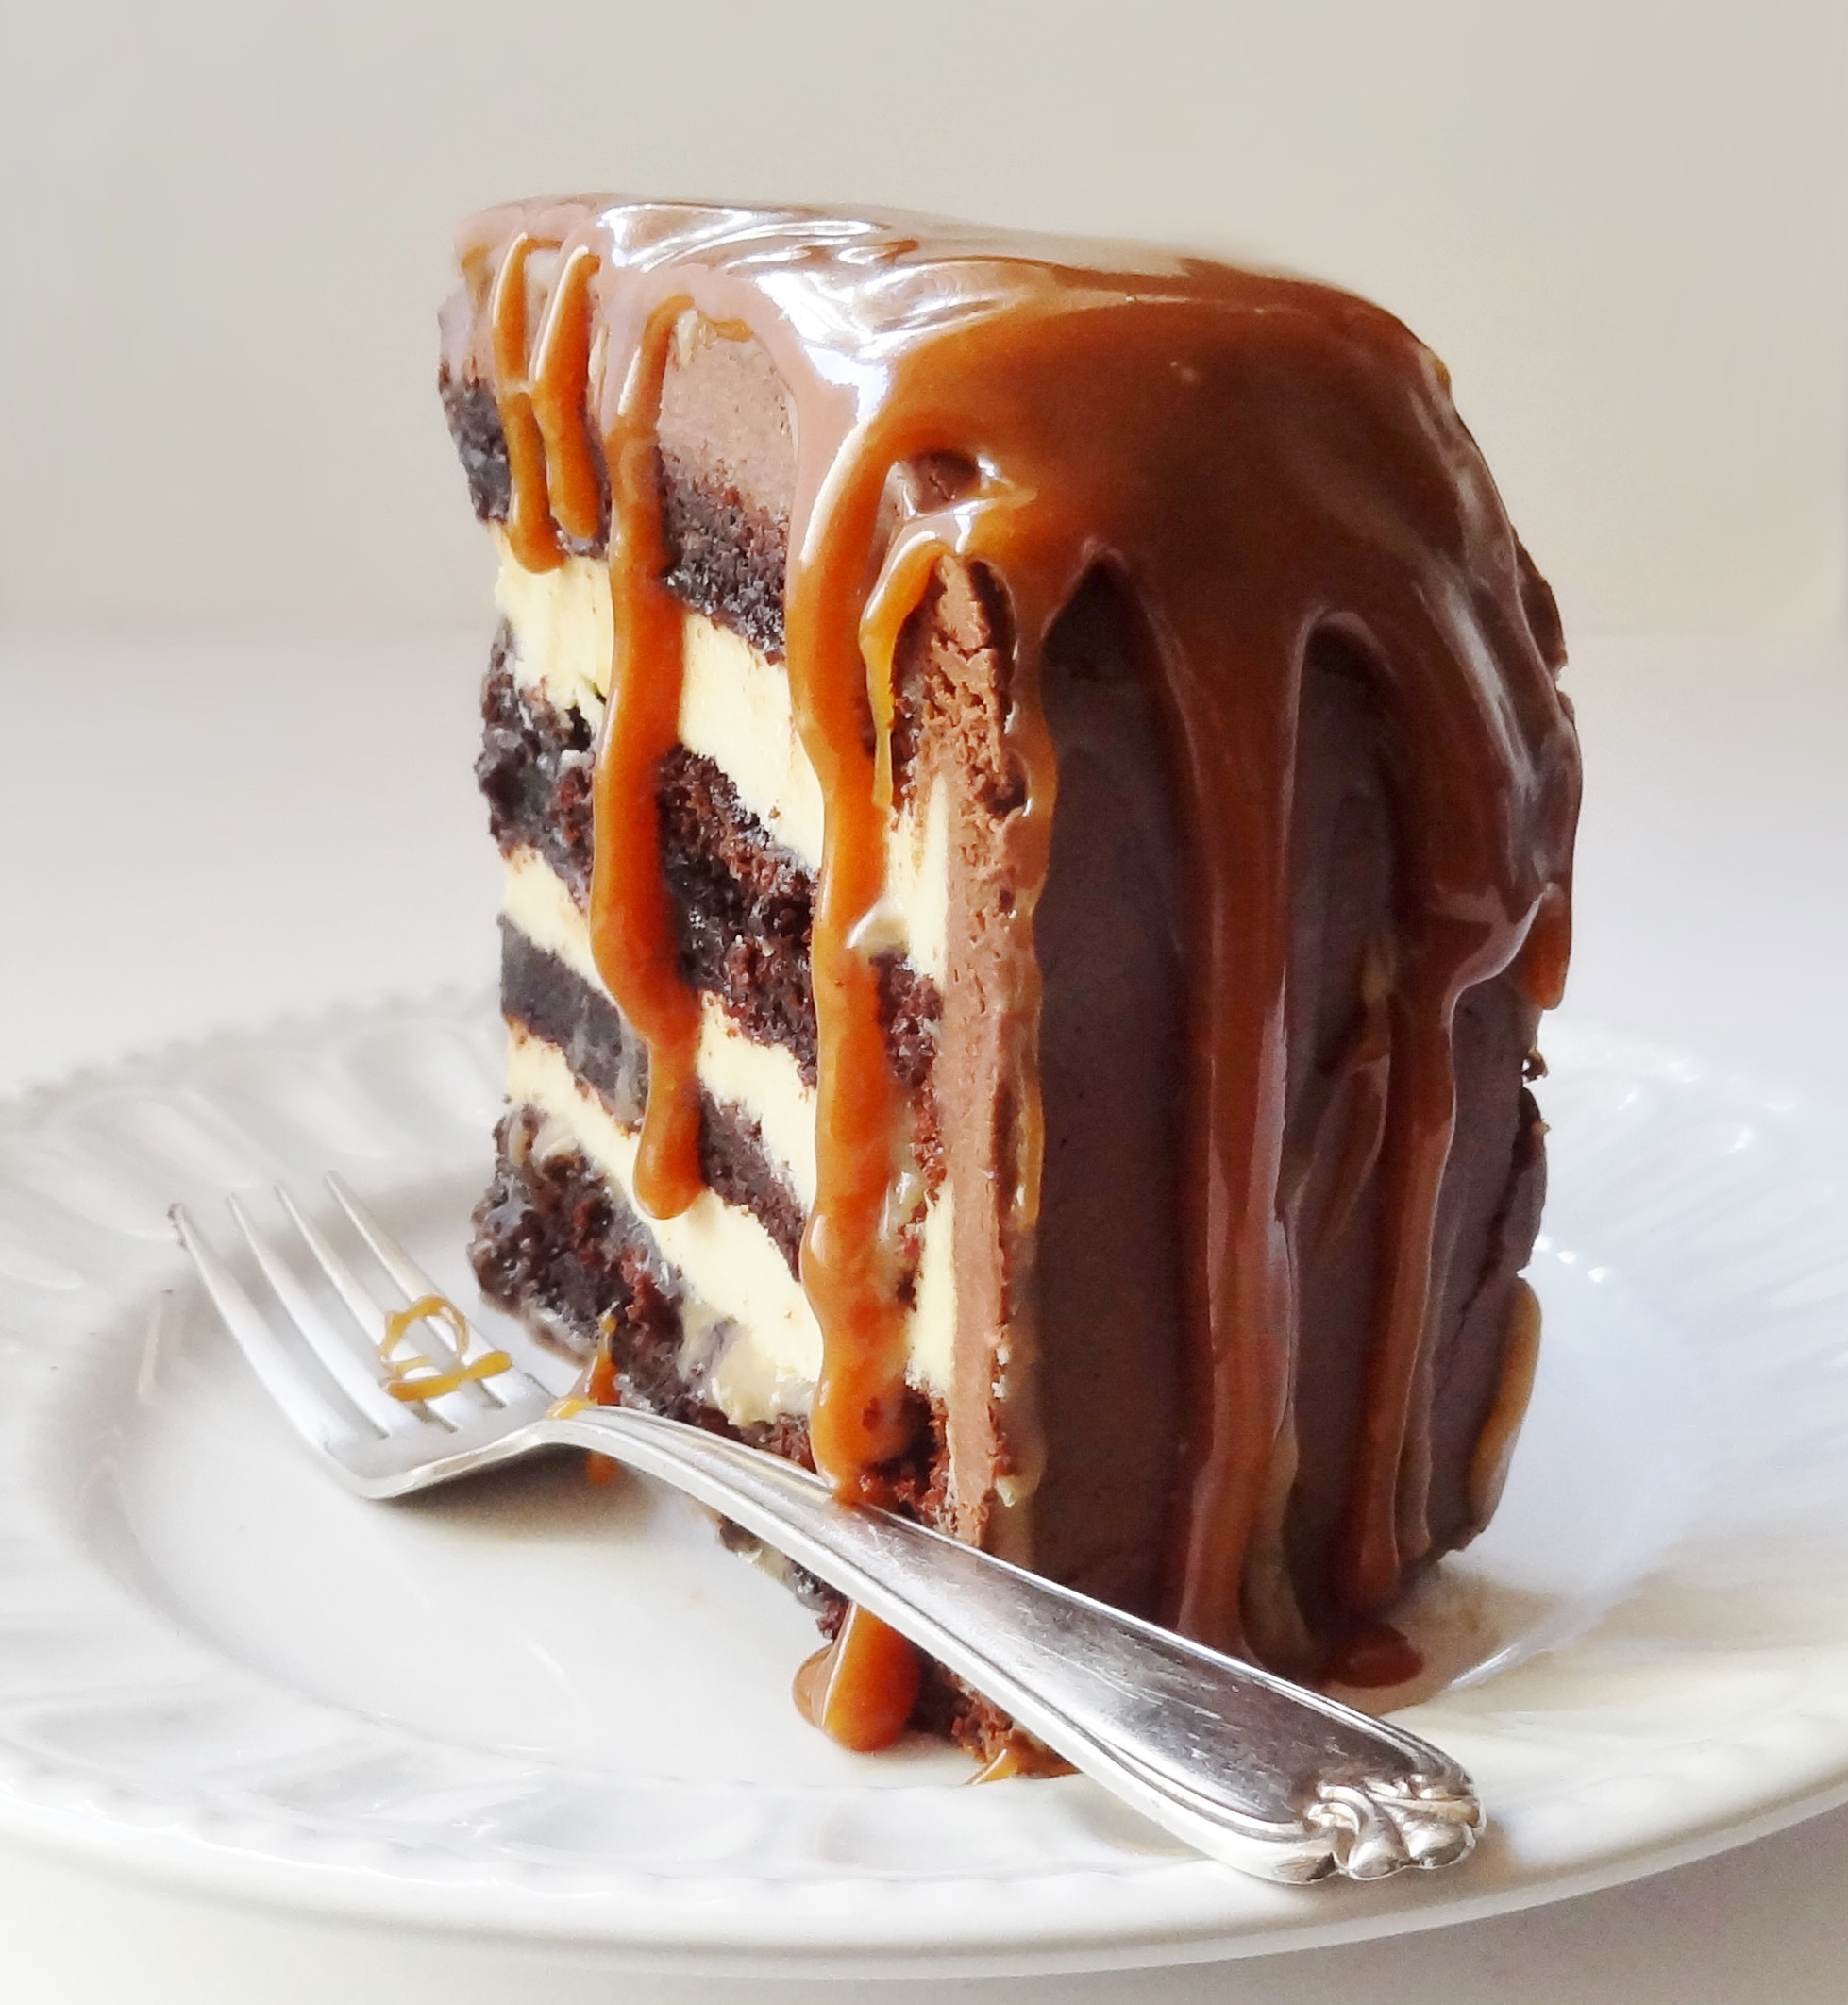 Chocolate Caramel Desserts  Salted Caramel Chocolate Fudge Cake Domestic Gothess